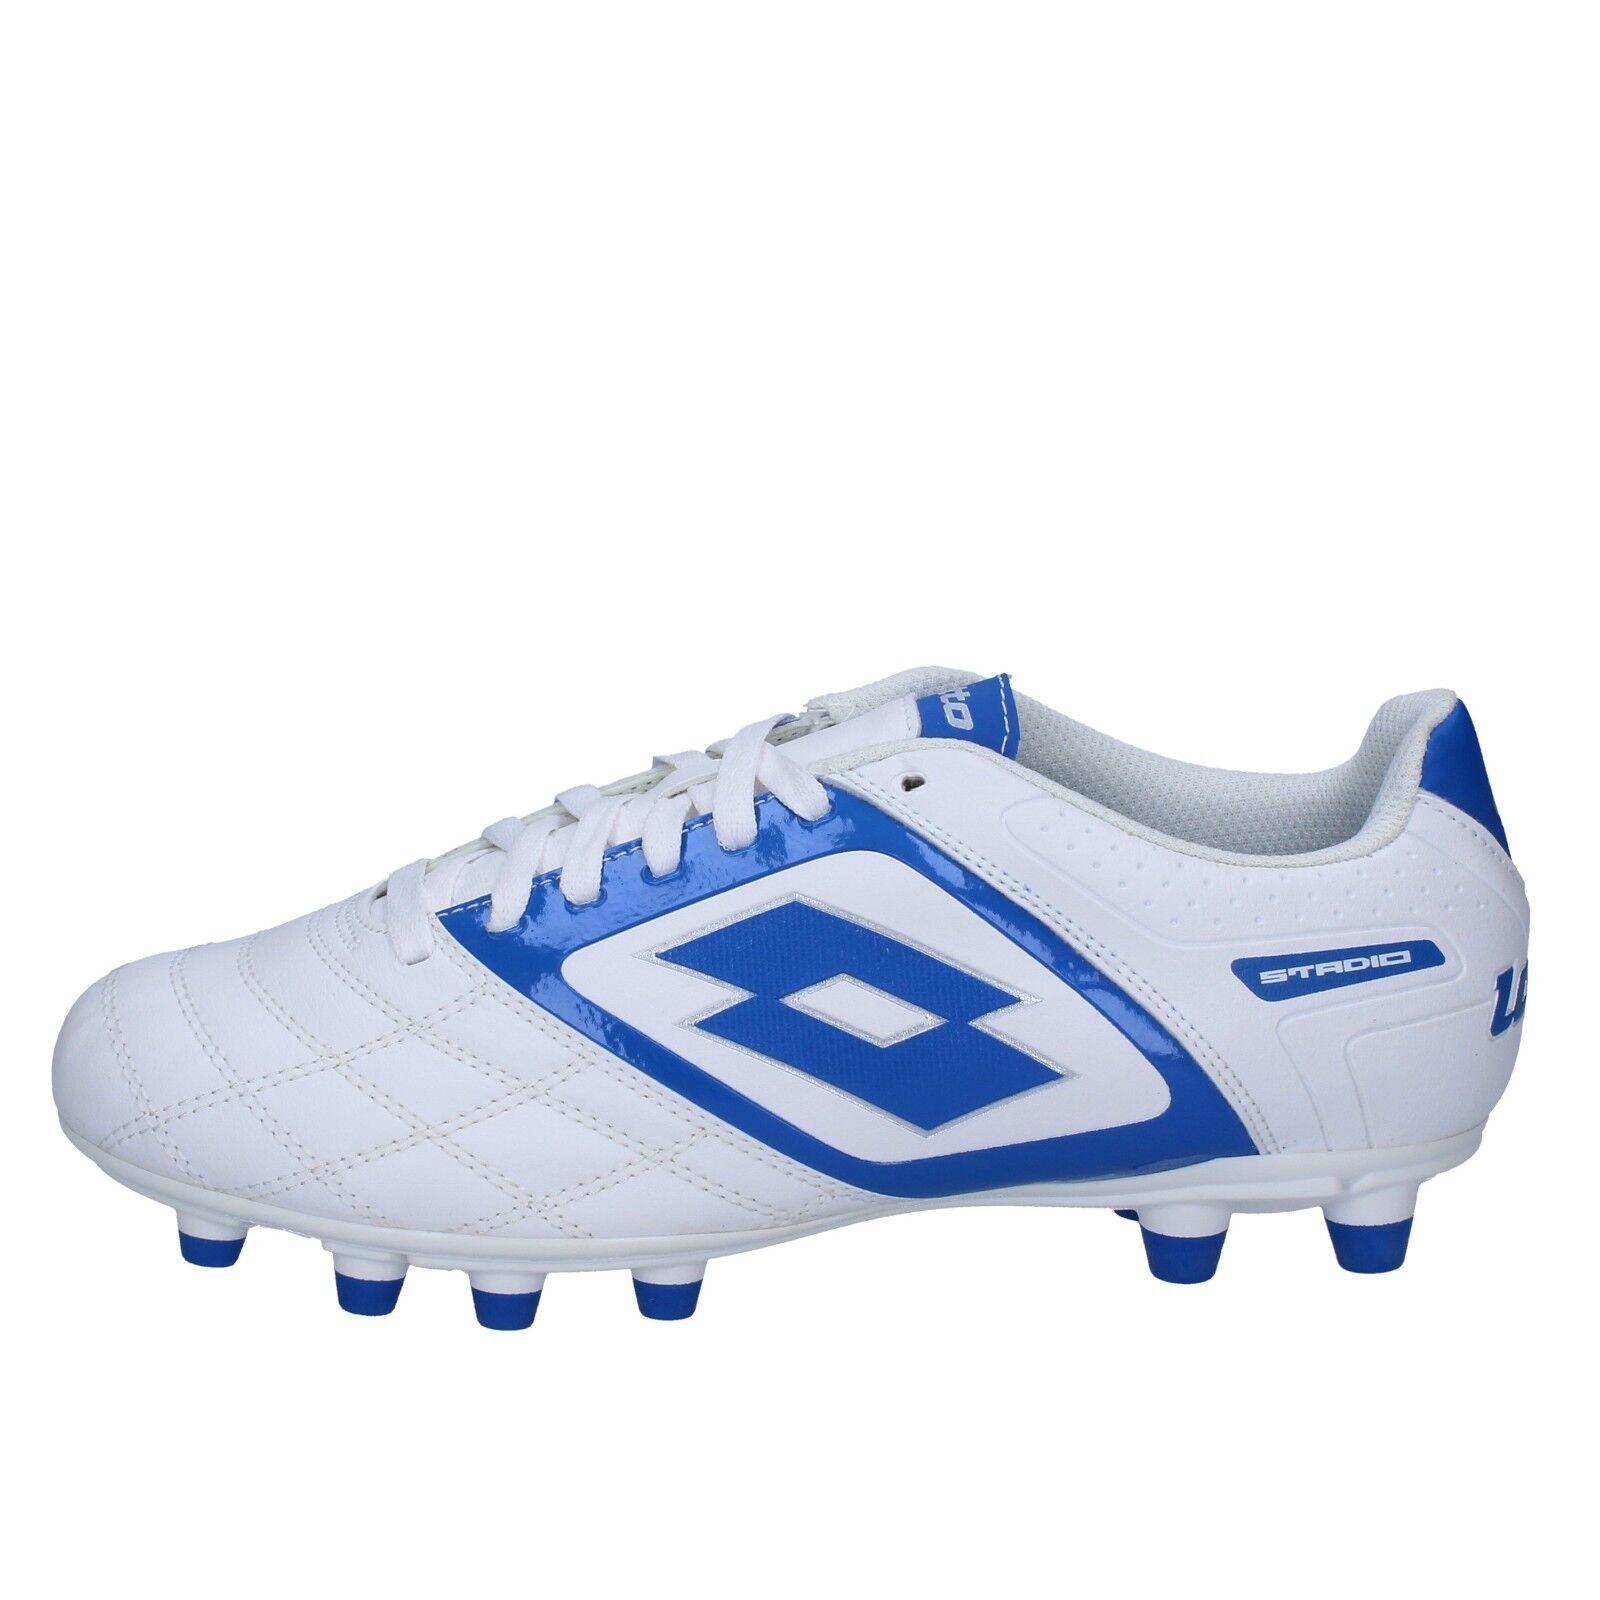 Men's Shoes LOTTO 46 Eu Sneakers Blue White Leather BT585-46